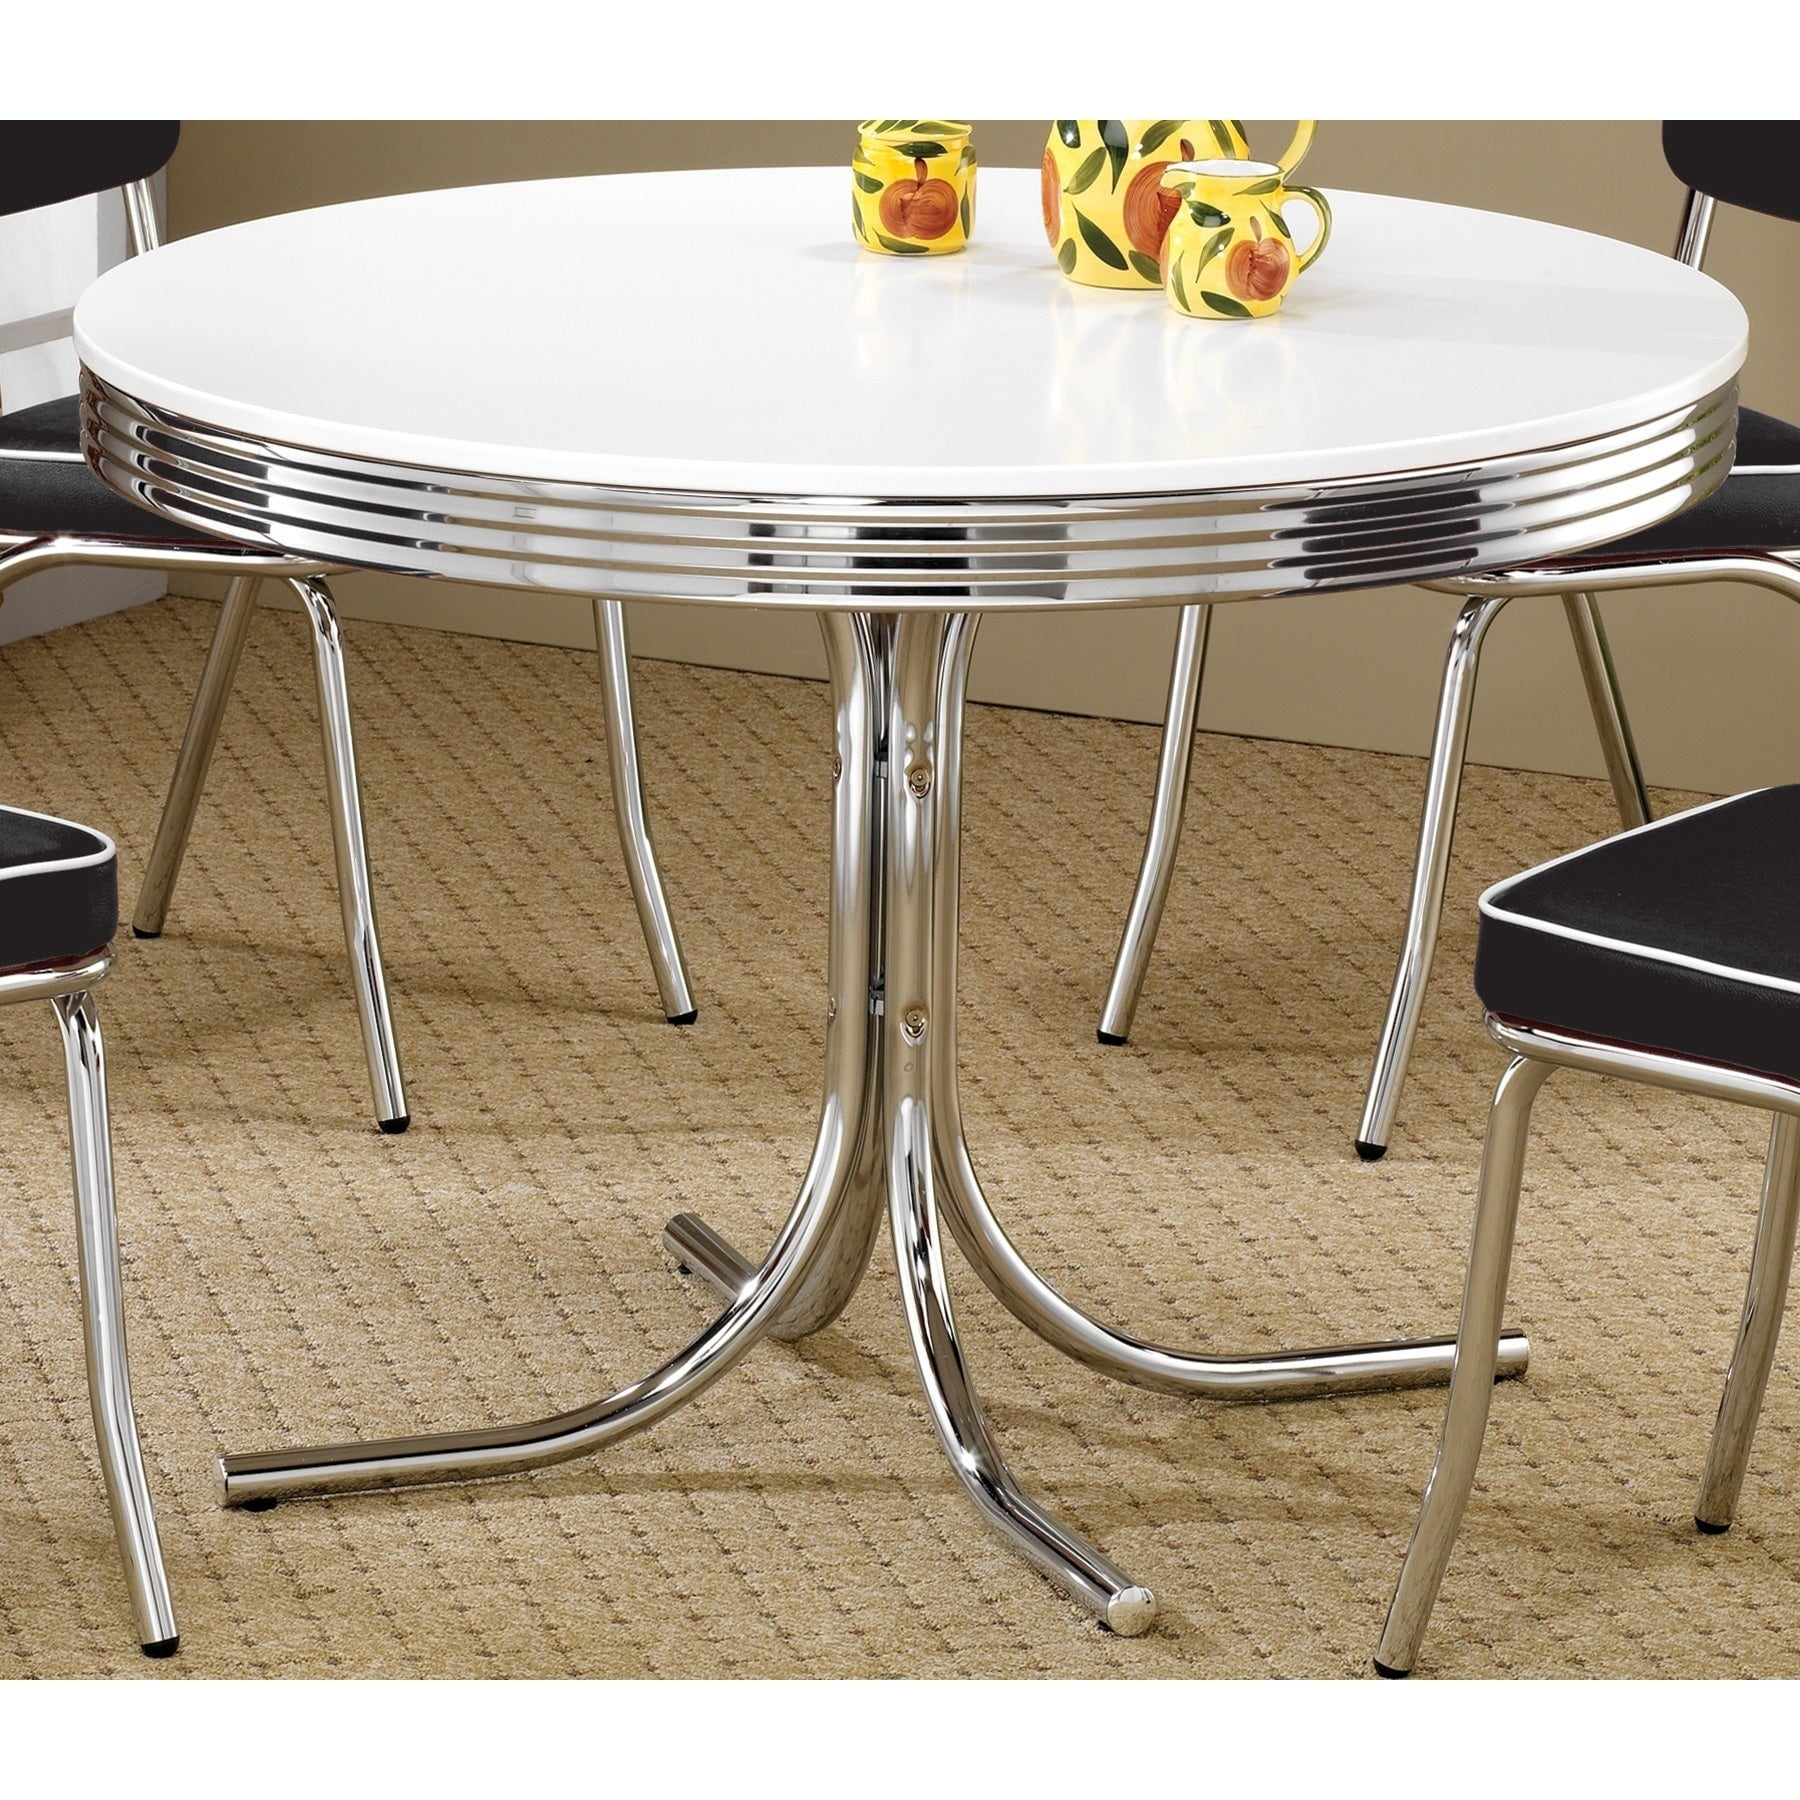 Chrome Plated Metal Round Retro Dining